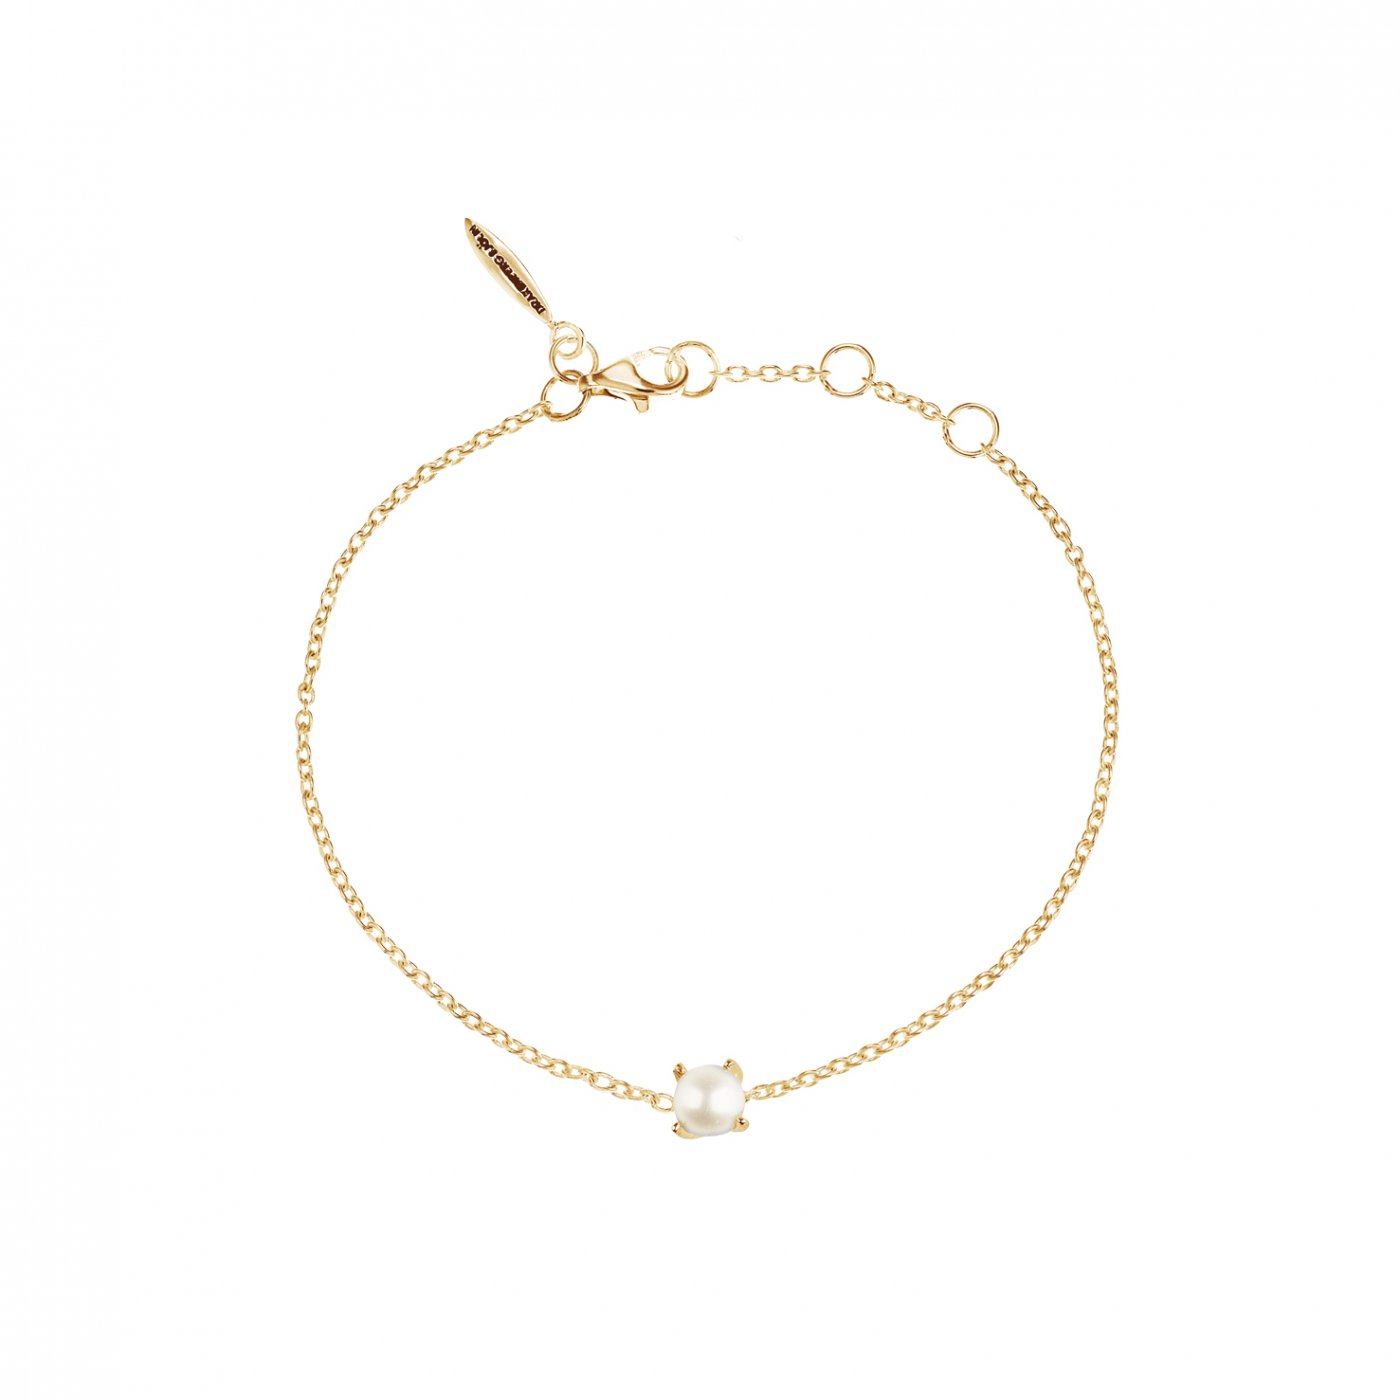 Petite-Pearl-drop-bracelet-gold-1400x1400